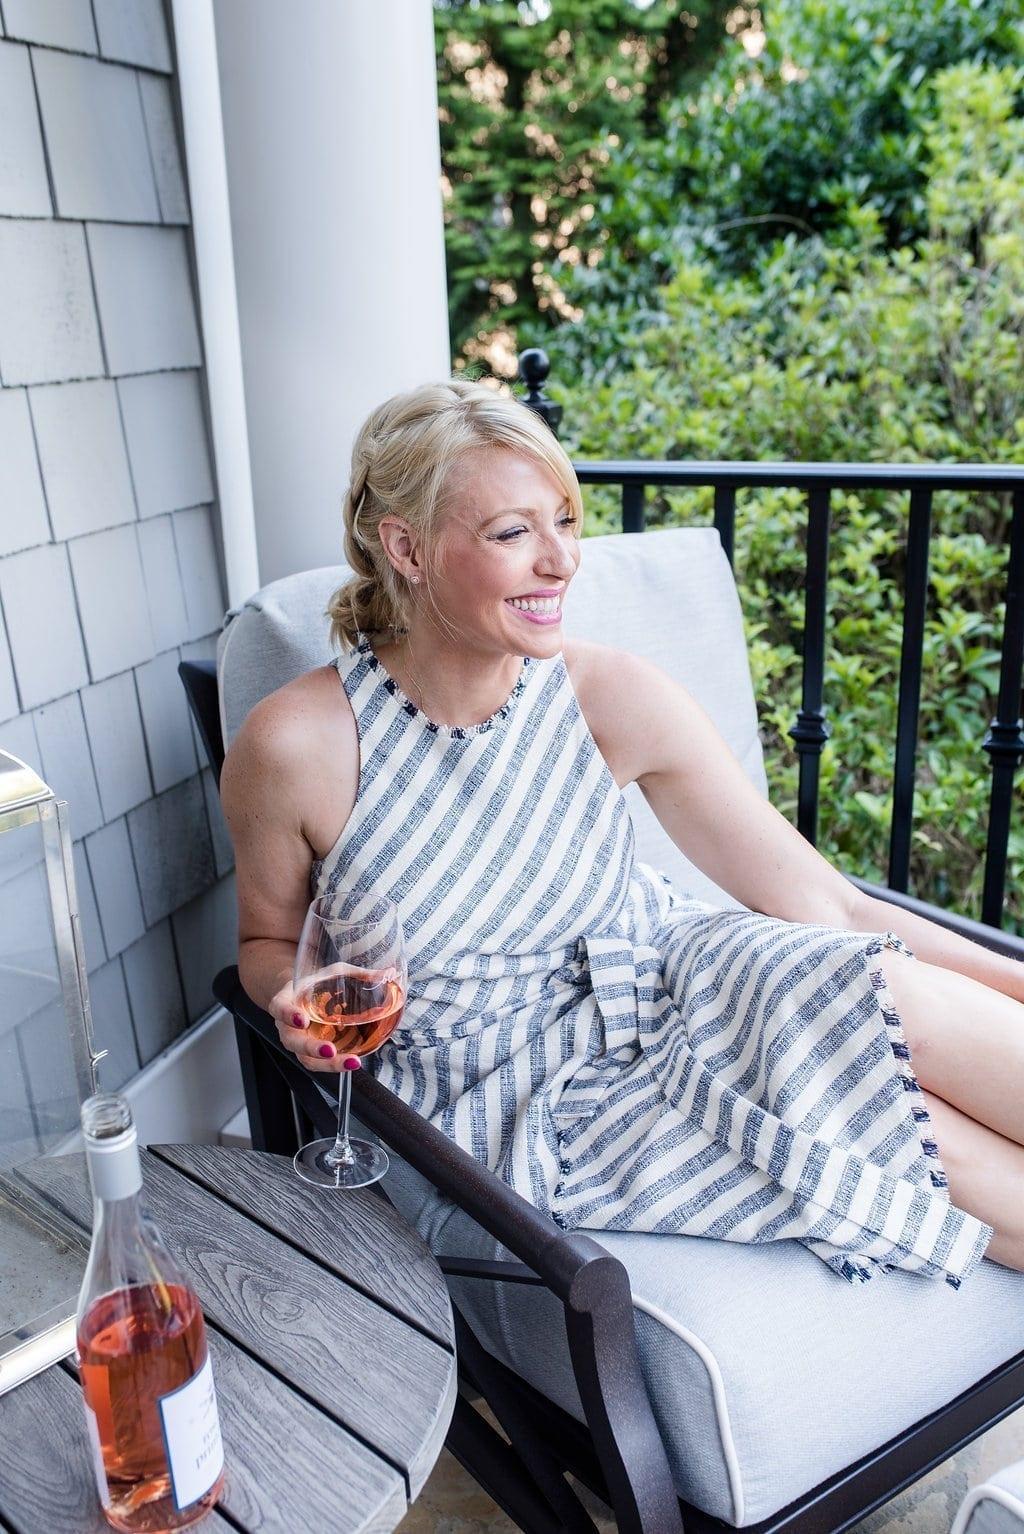 Summer hair and summer stripe dress.